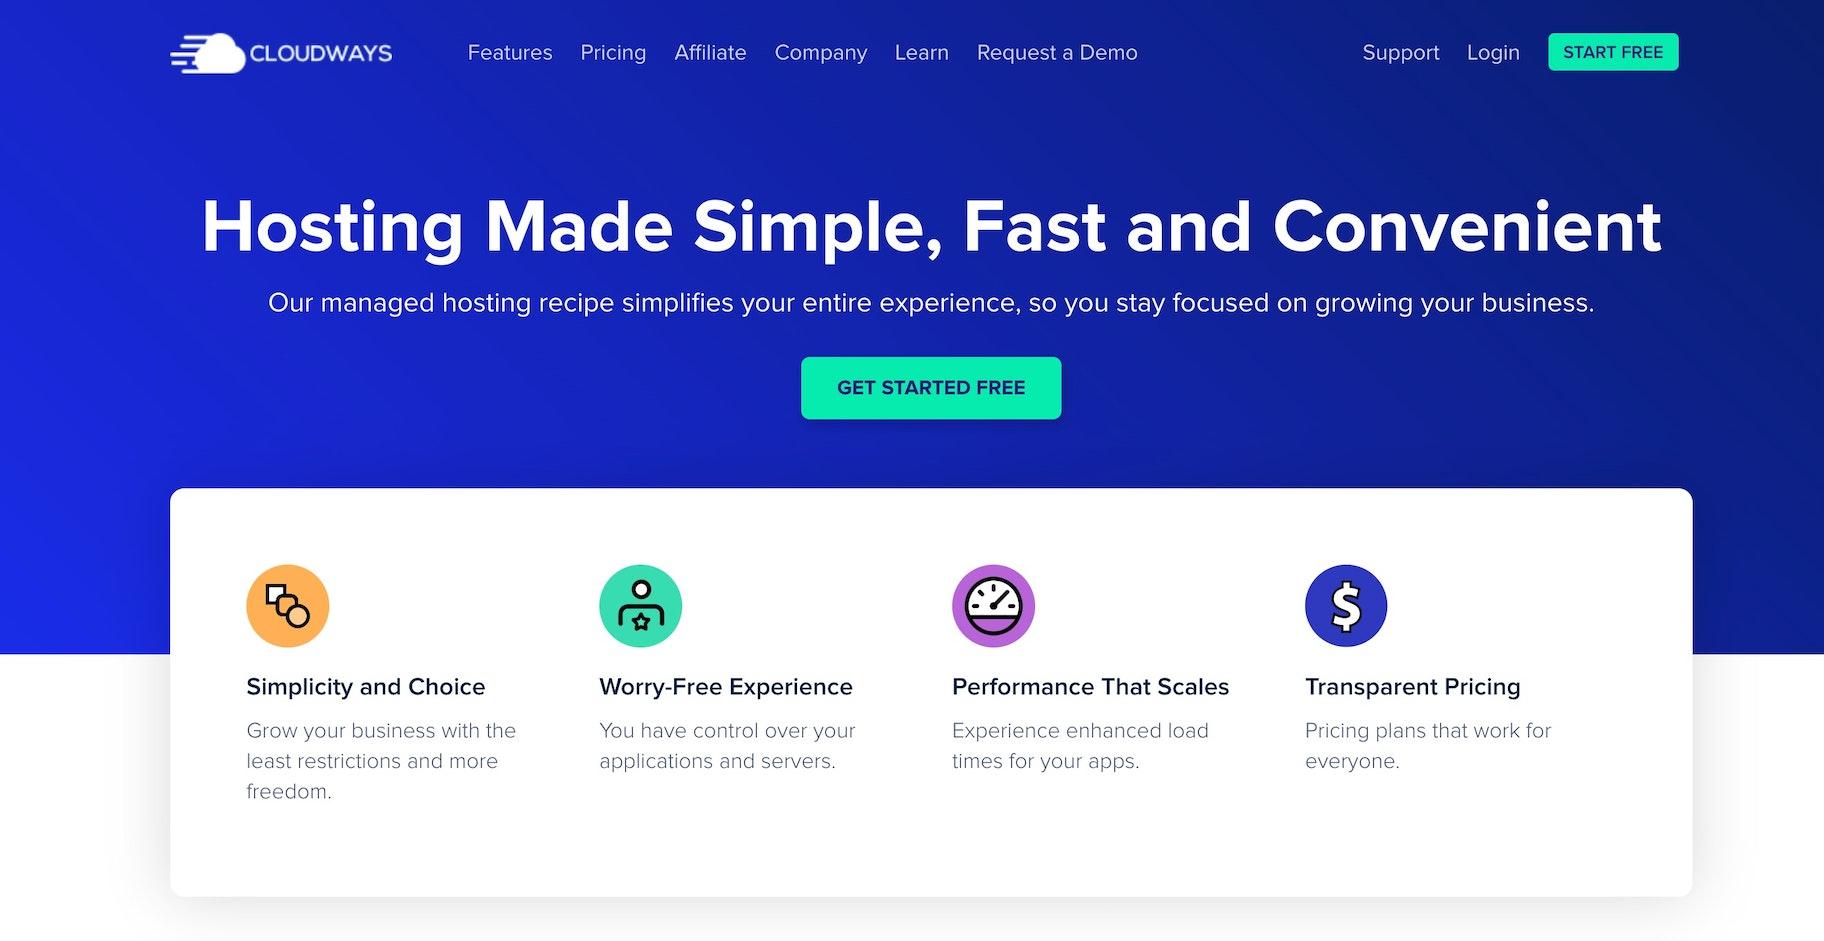 Cloud-based ecommerce hosting: Cloudways